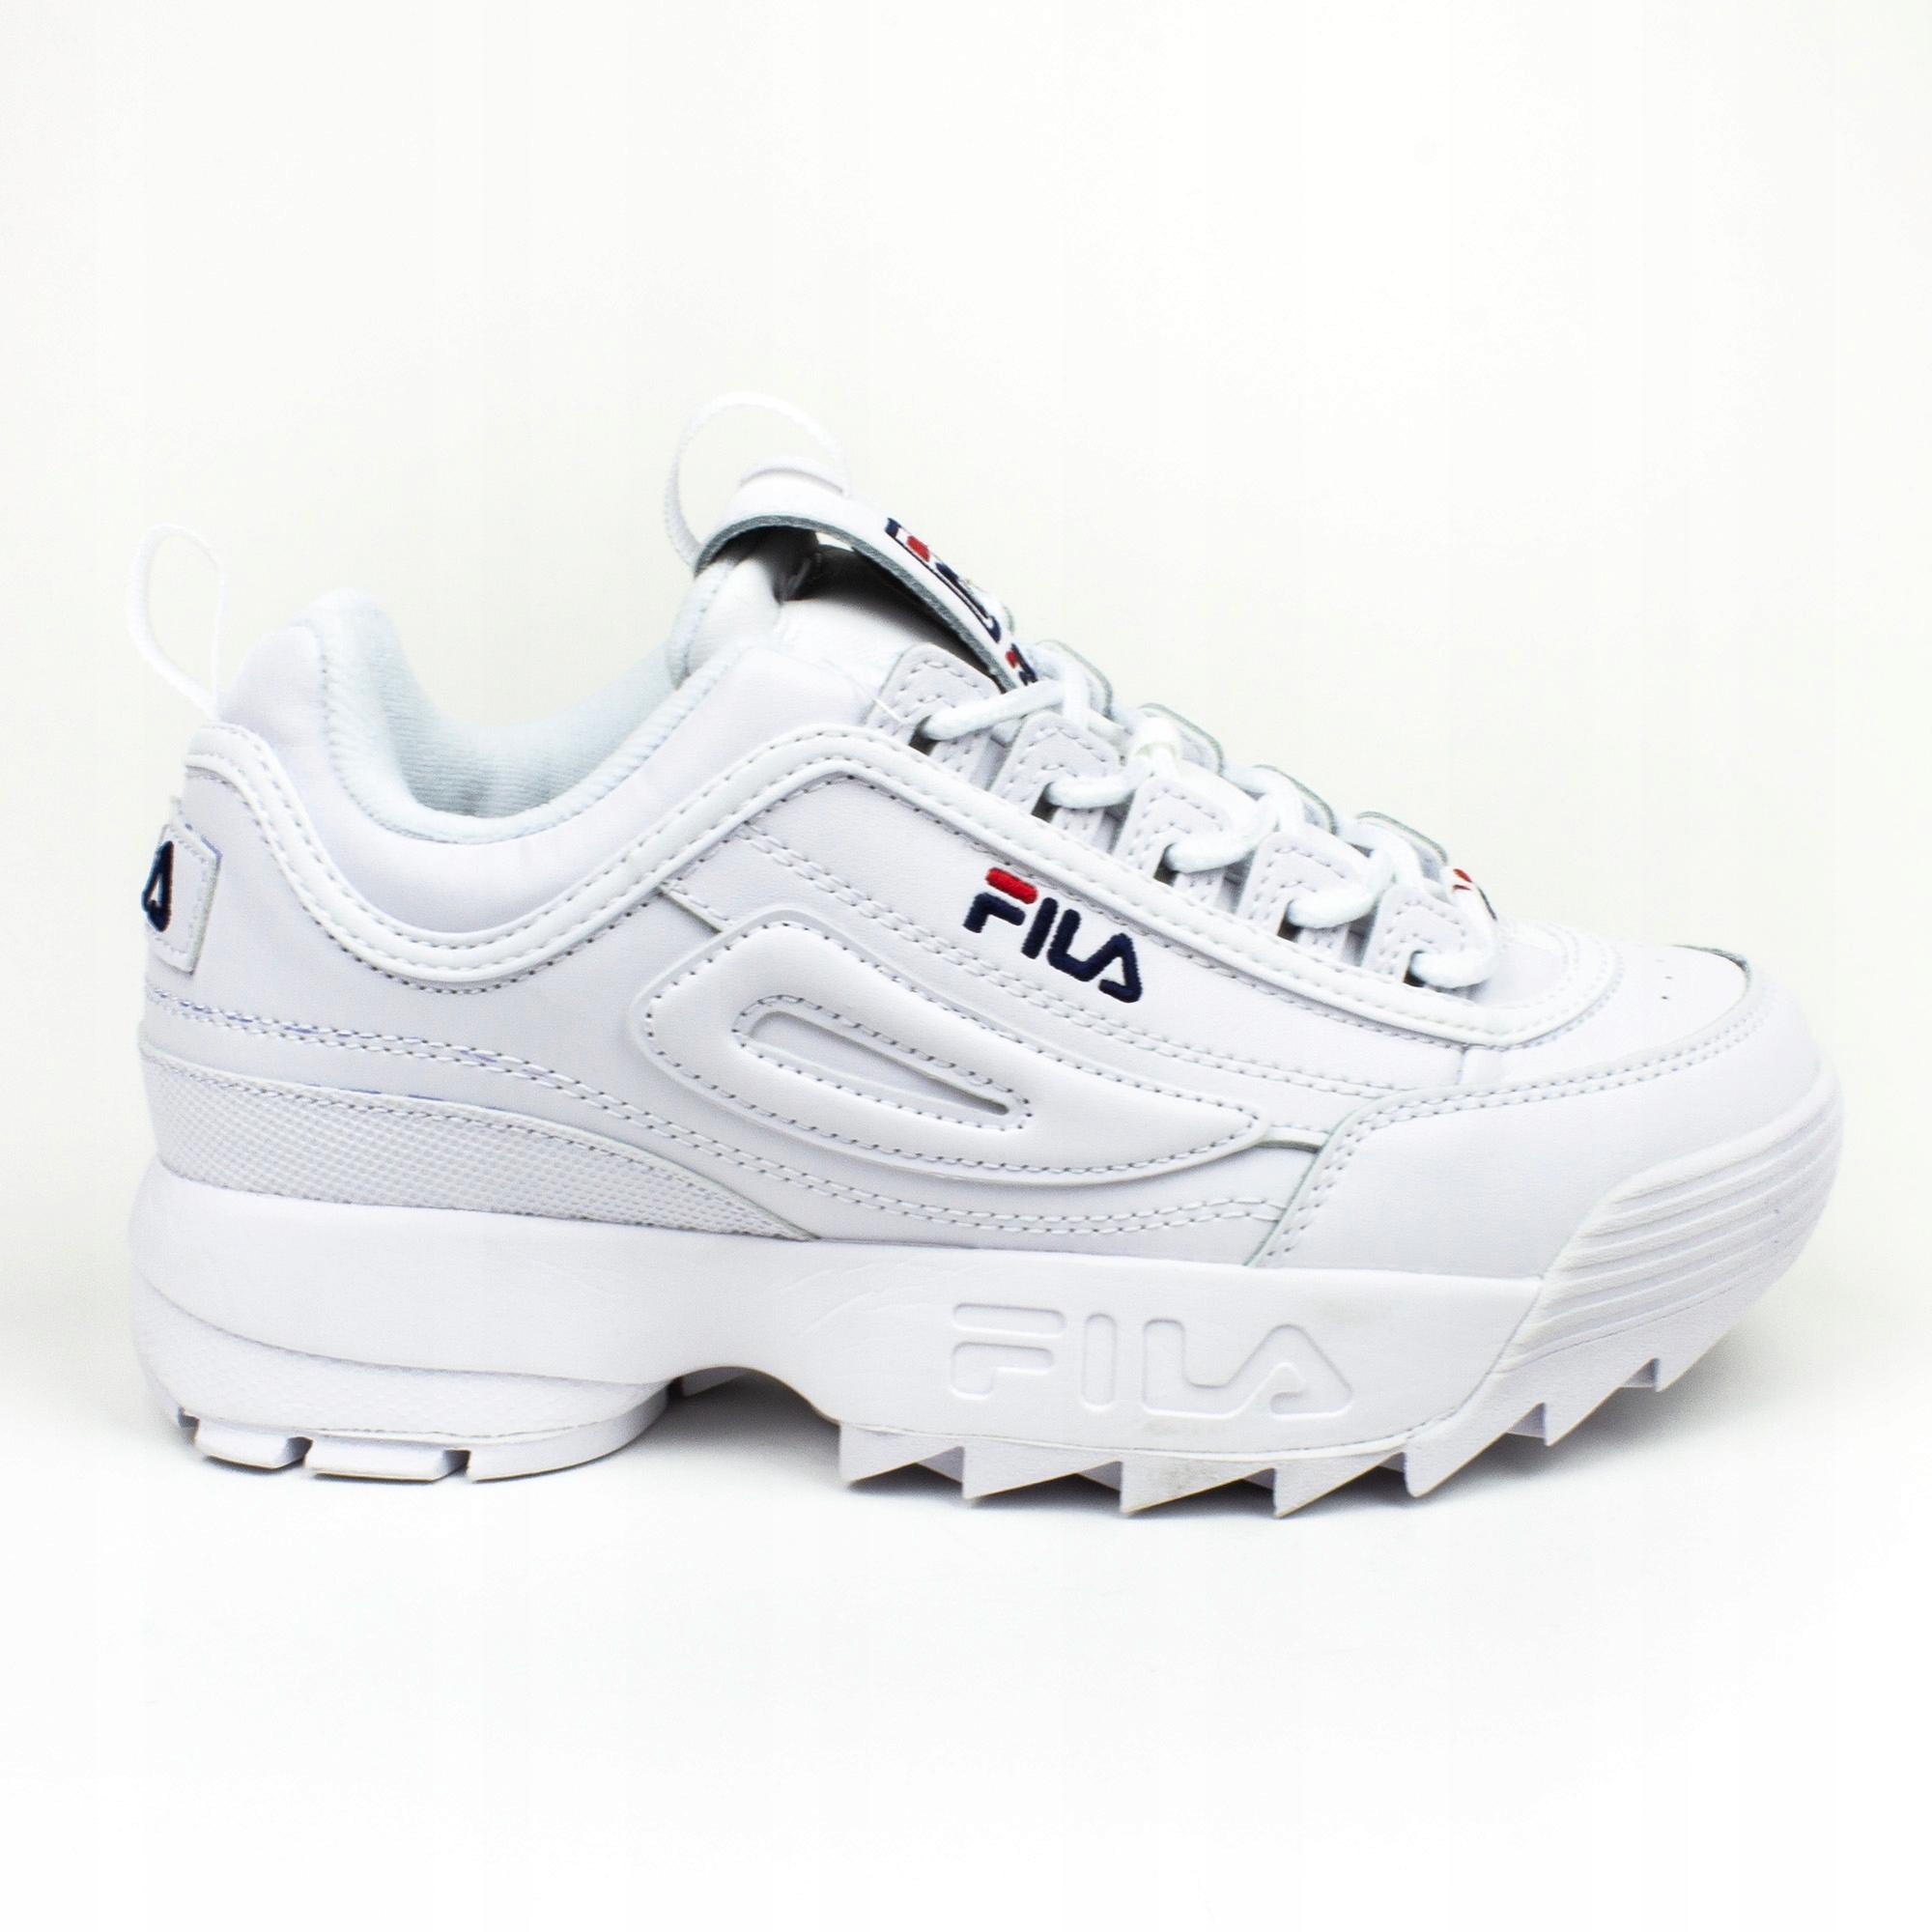 FILA Disruptor II Premium White, Red & Blue Shoes